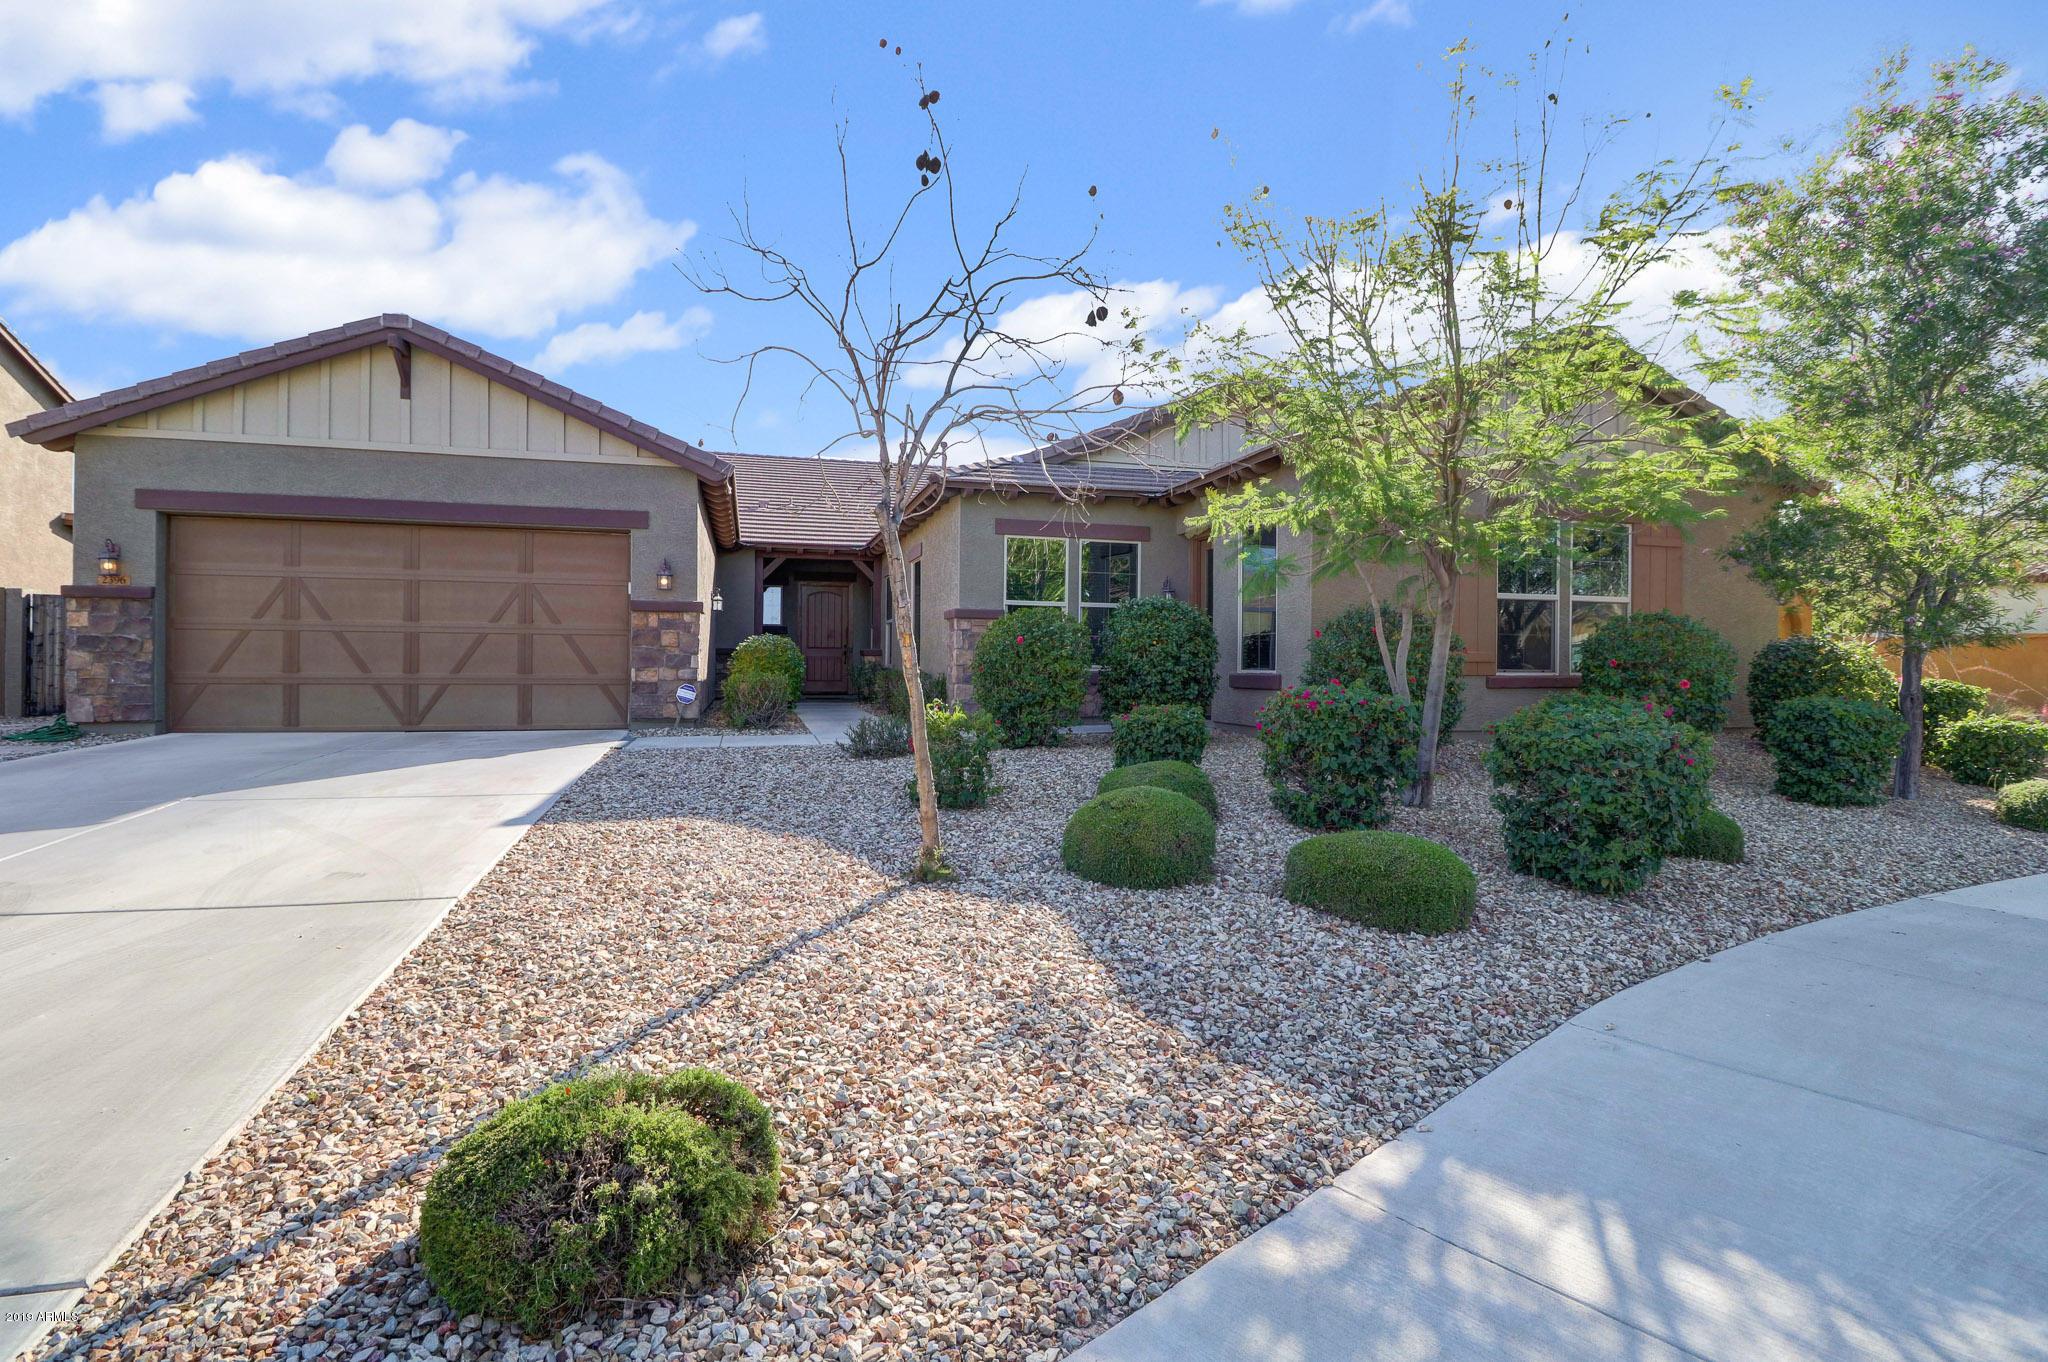 Photo of 2396 N 160TH Avenue, Goodyear, AZ 85395